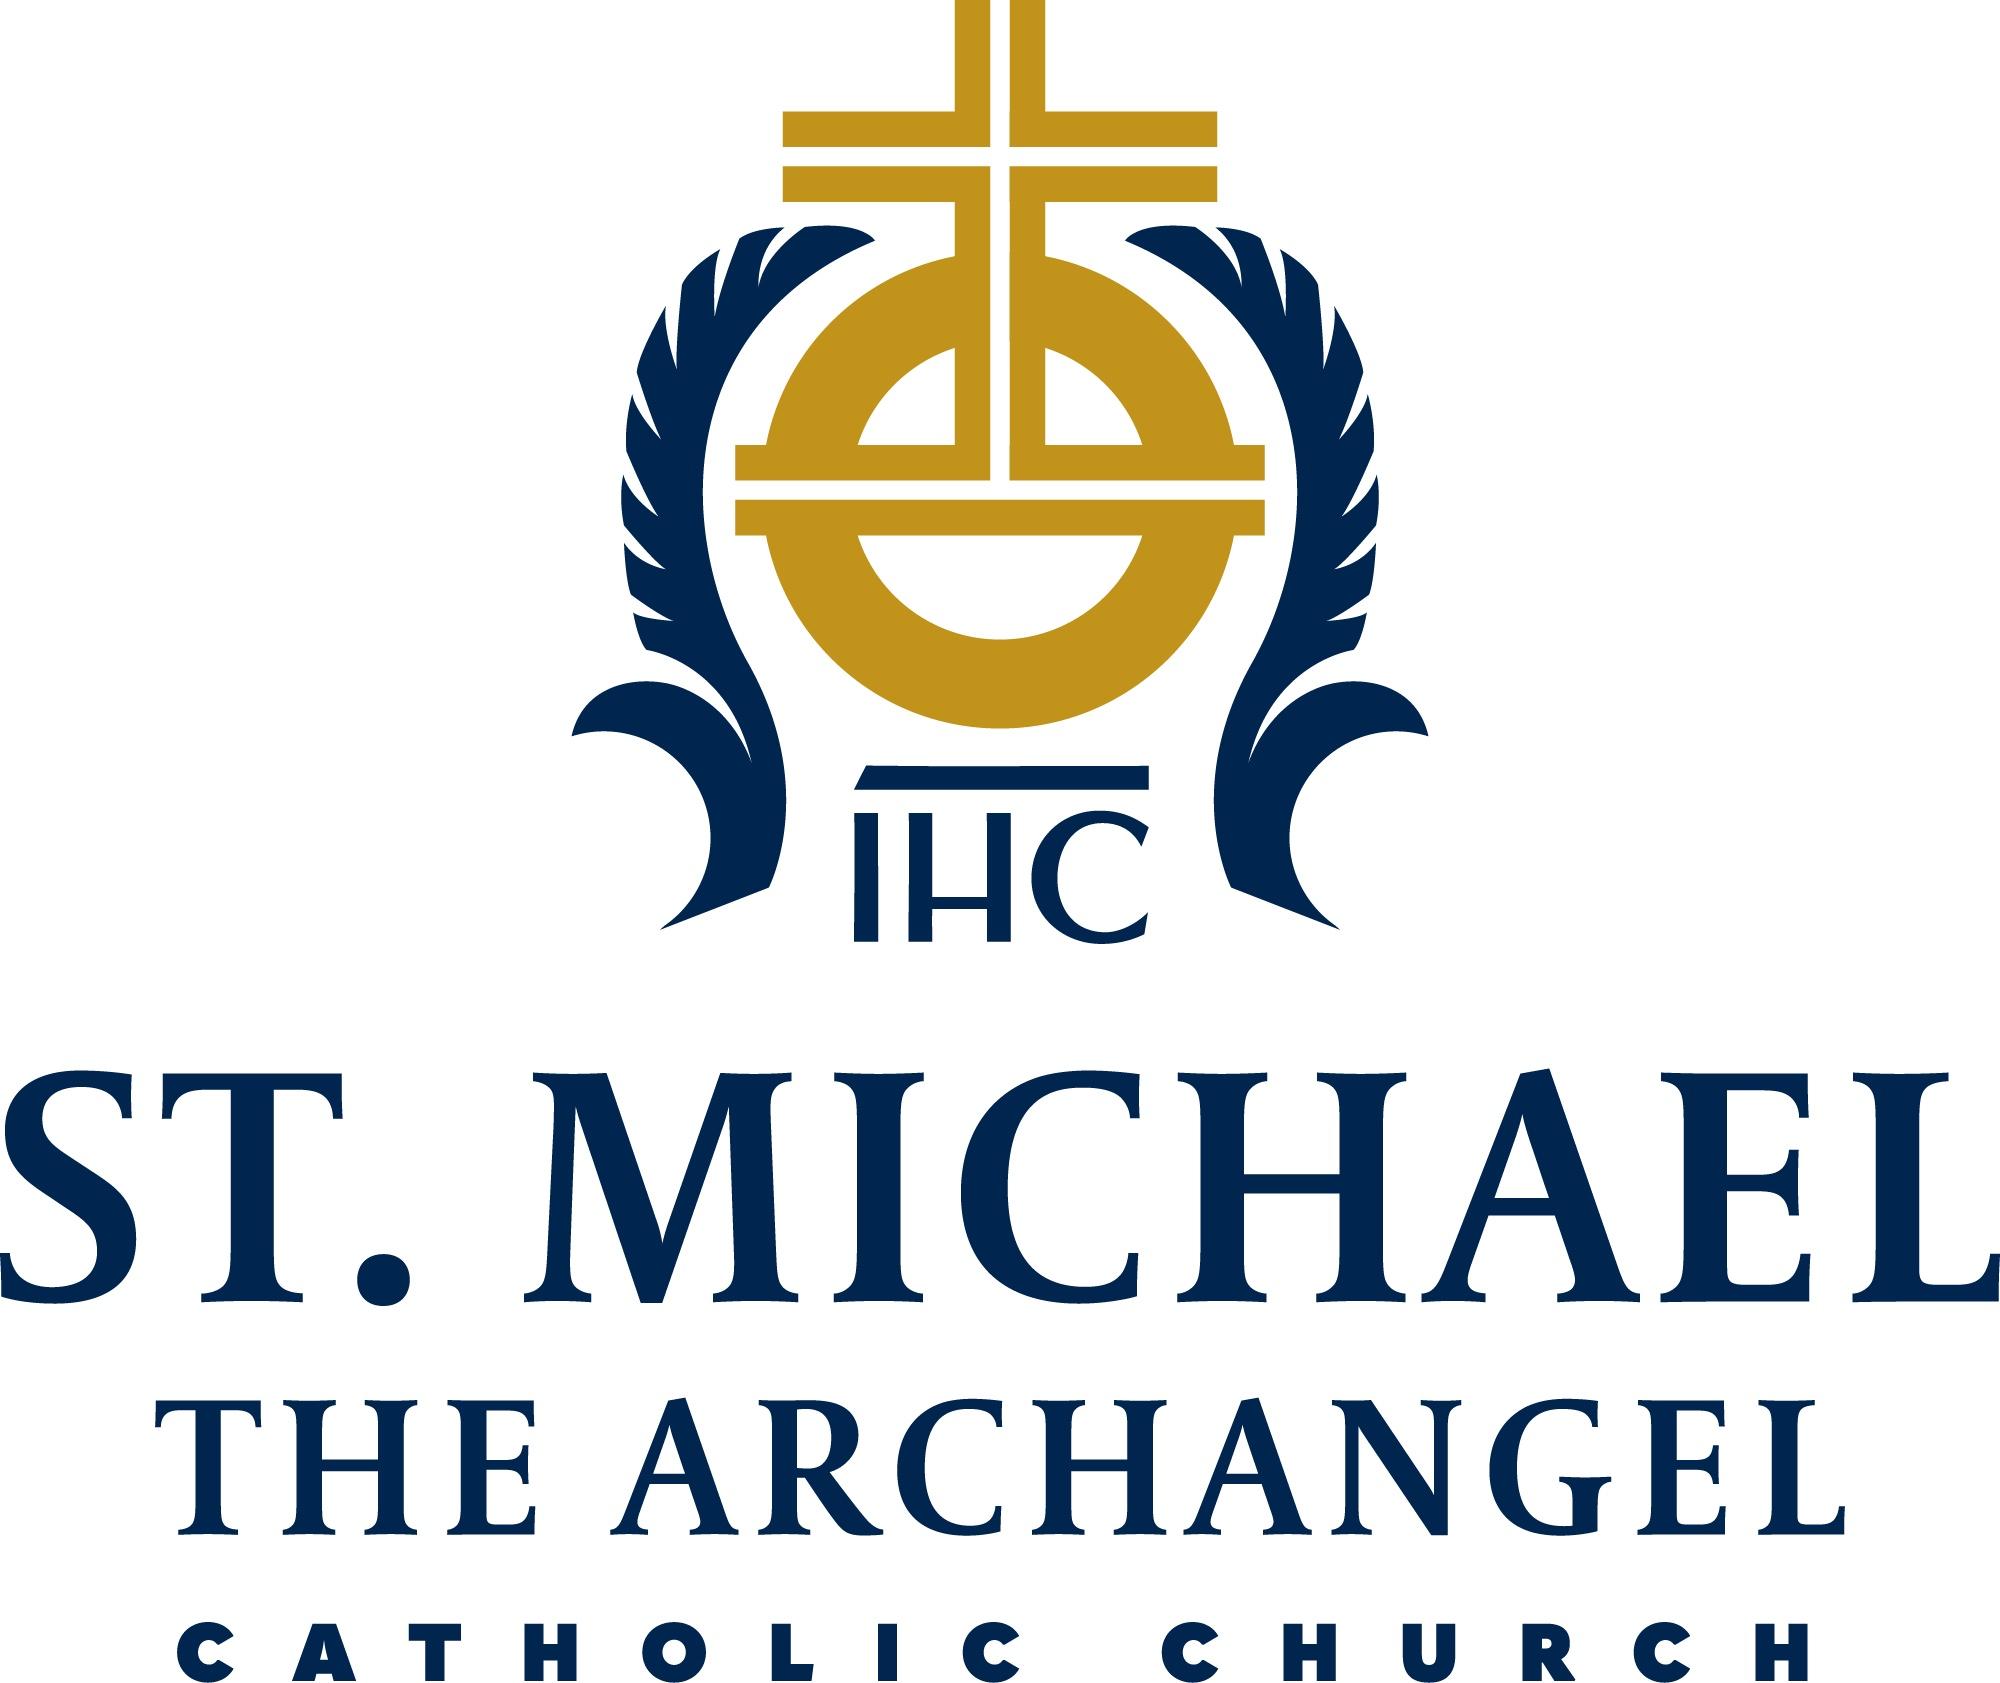 St Michael The Archangel Catholic Church